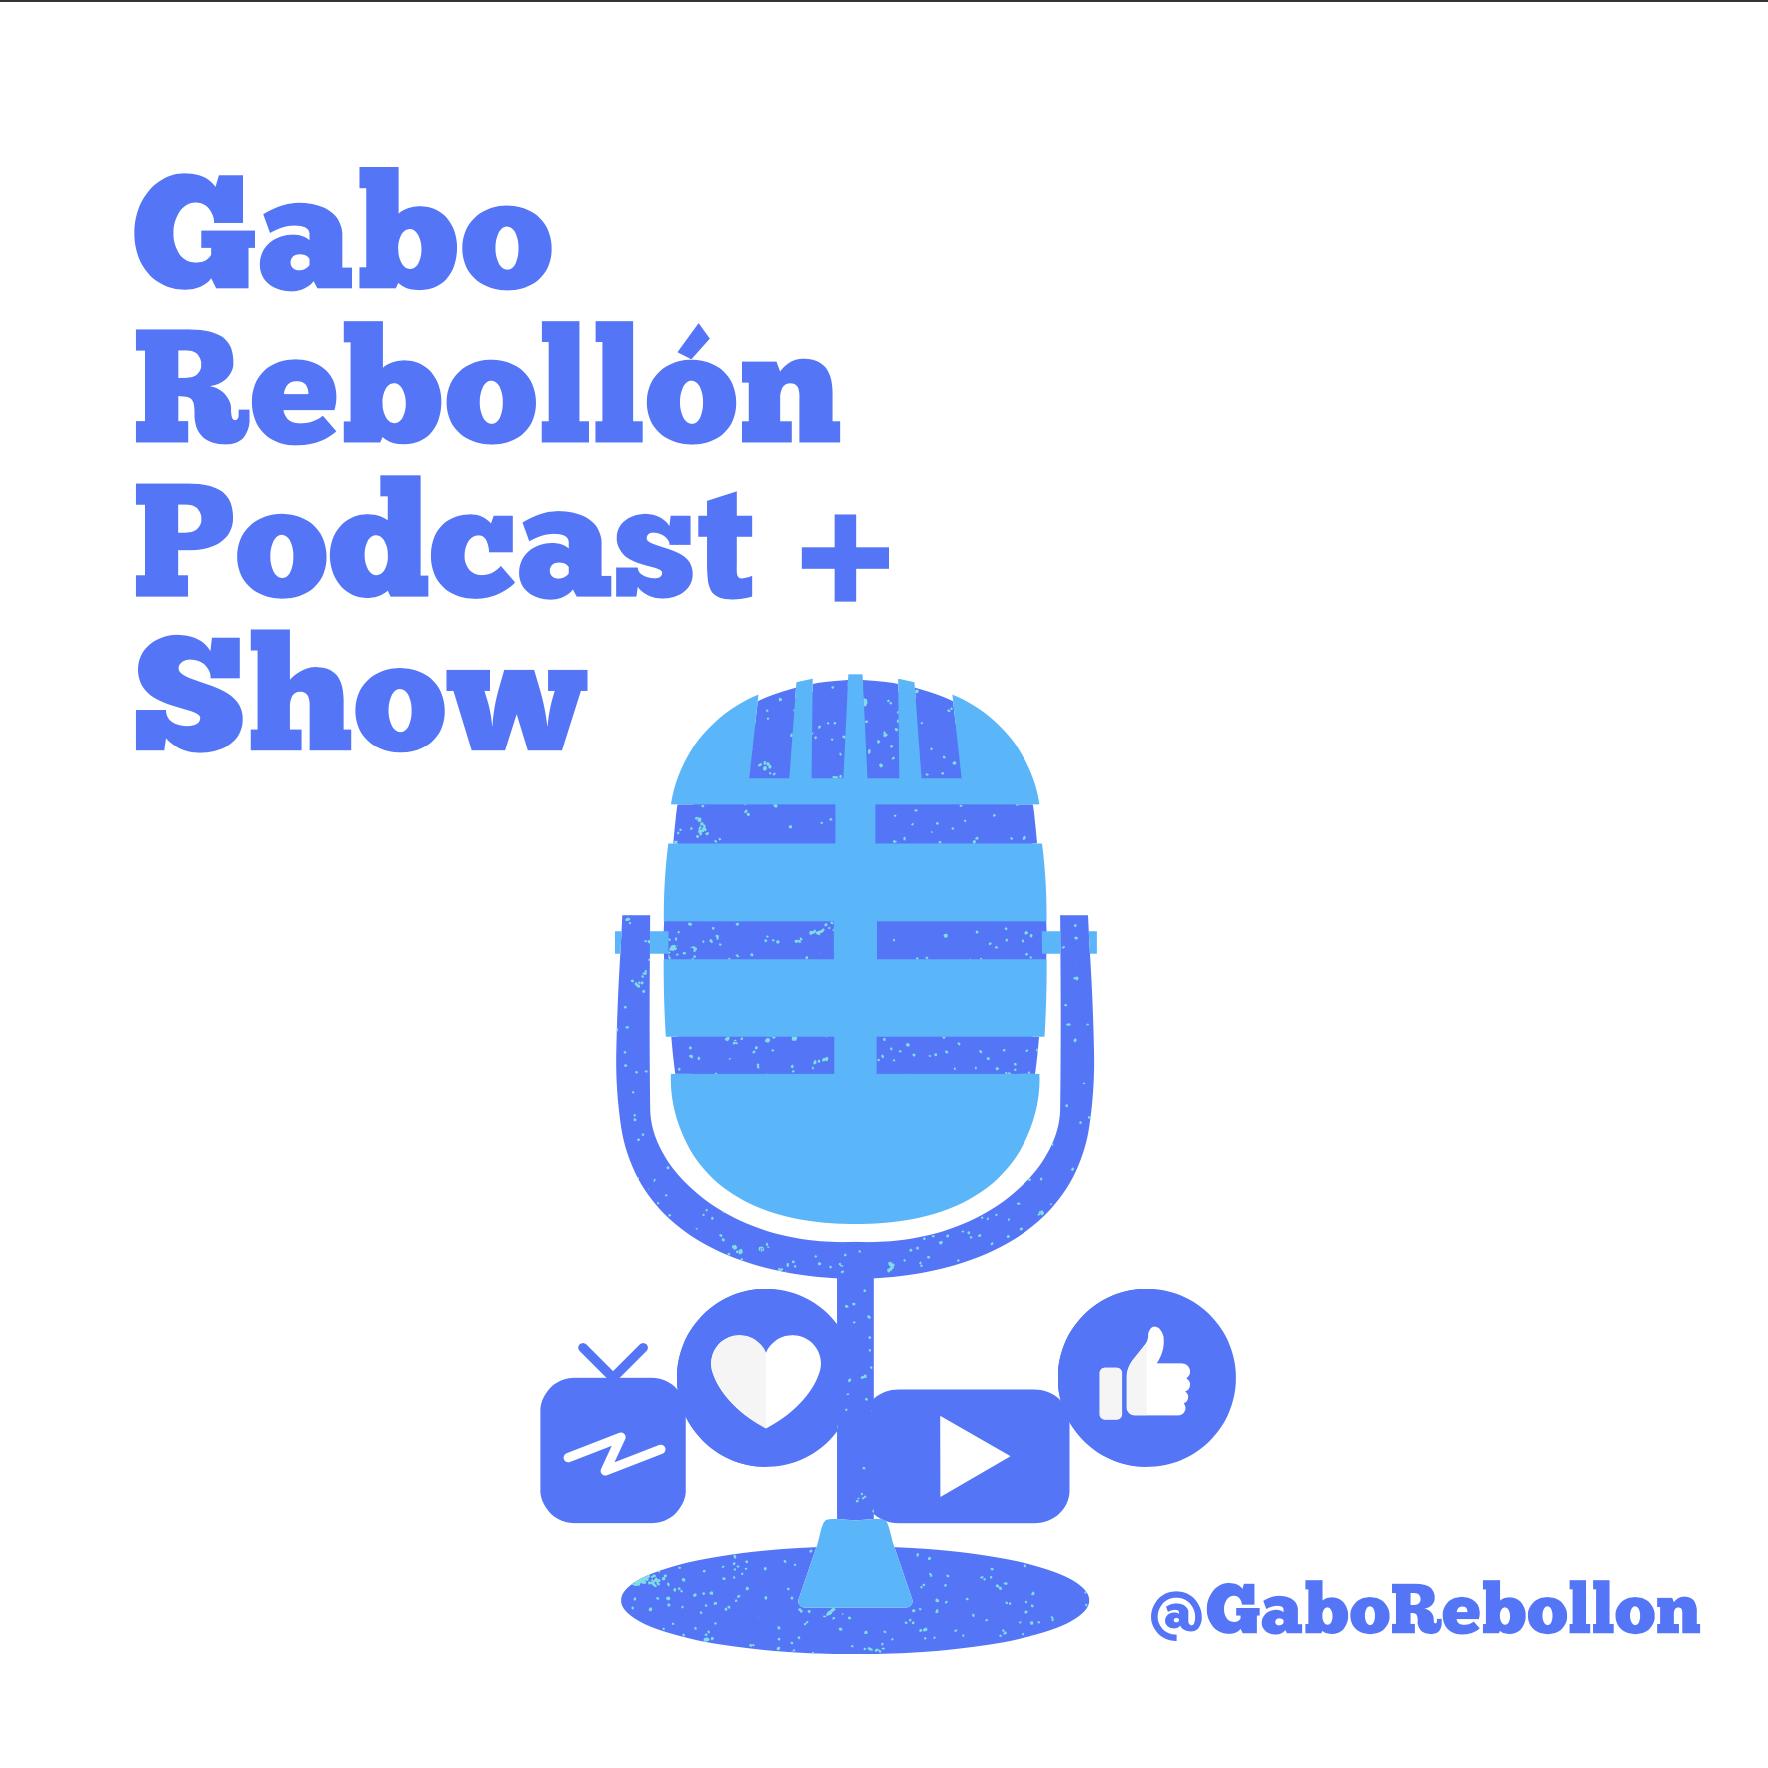 Gabo Rebollon Podcast Show